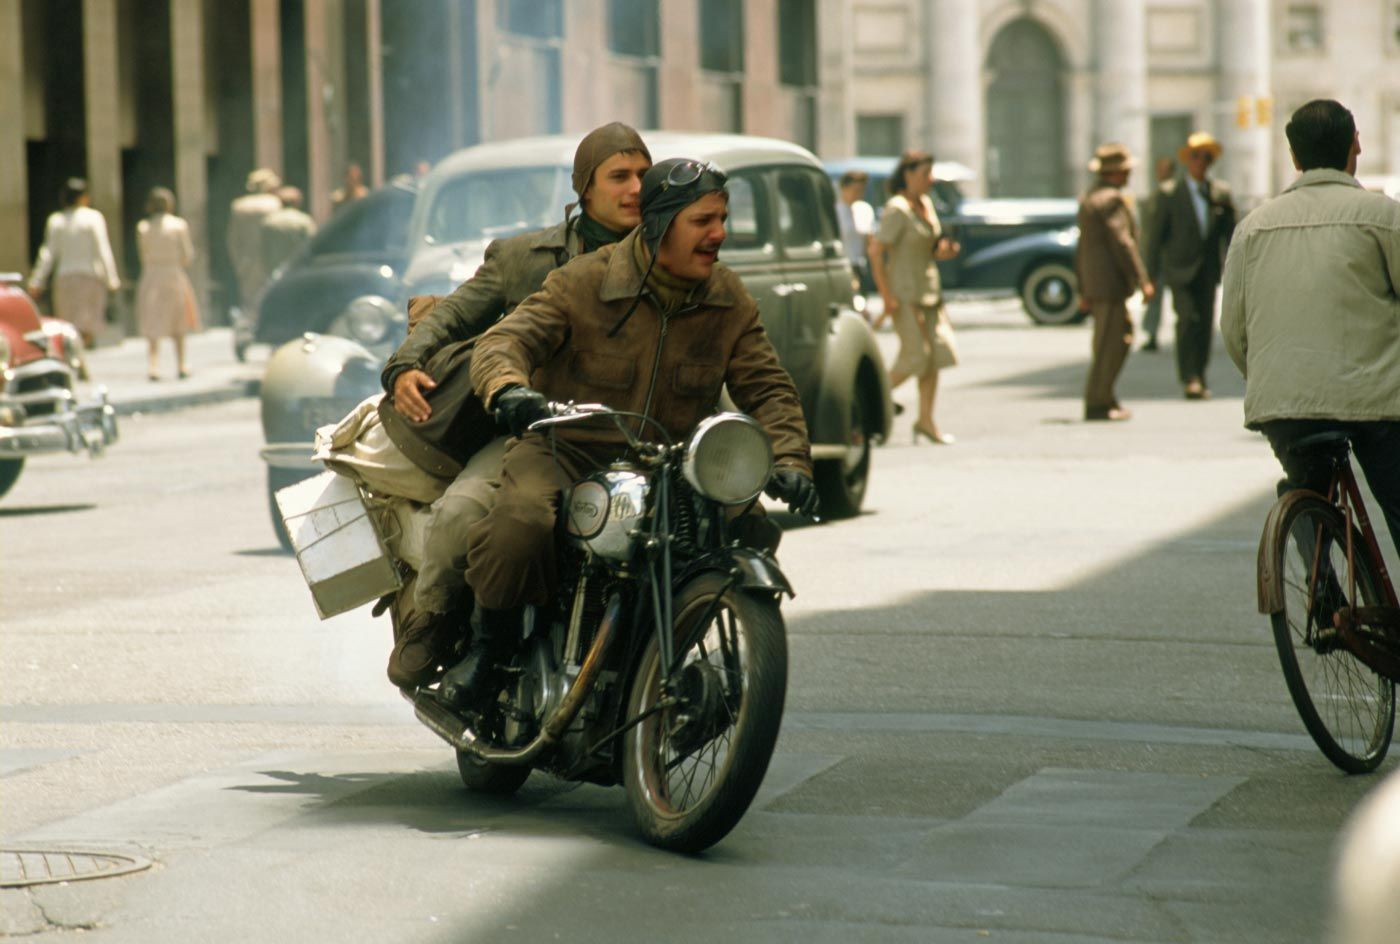 Google Image Result For Http 4 Bp Blogspot Com Joenkzs77gk Tdqimvbcxui Aaaaa Travel Movies Norton Motorcycle